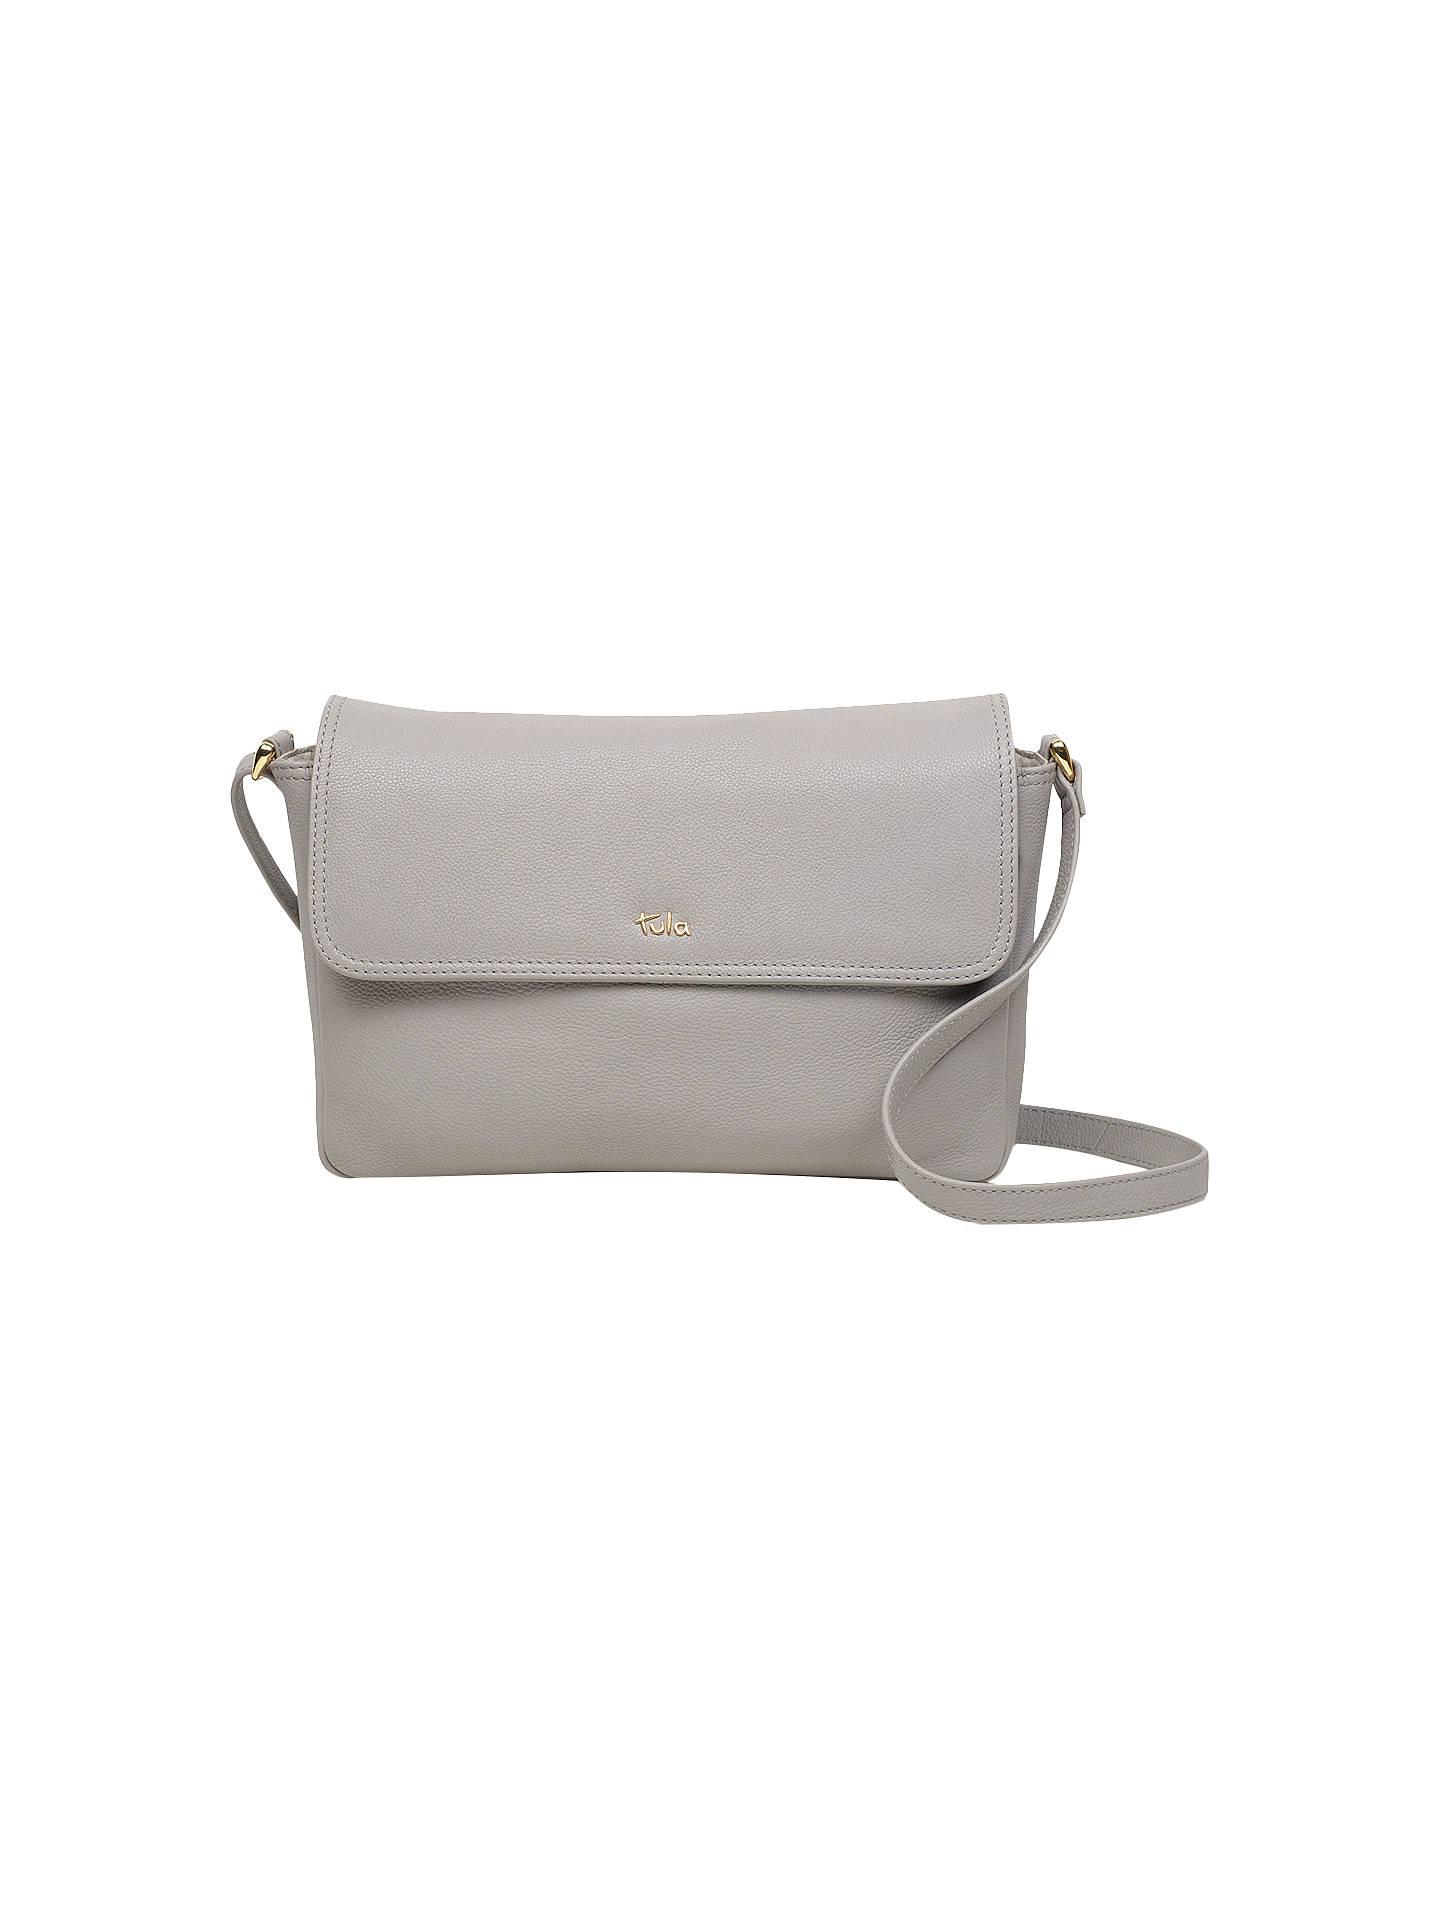 b3698d17822 BuyTula Nappa Originals Leather Medium Flapover Cross Body Bag, Light Grey  Online at johnlewis.